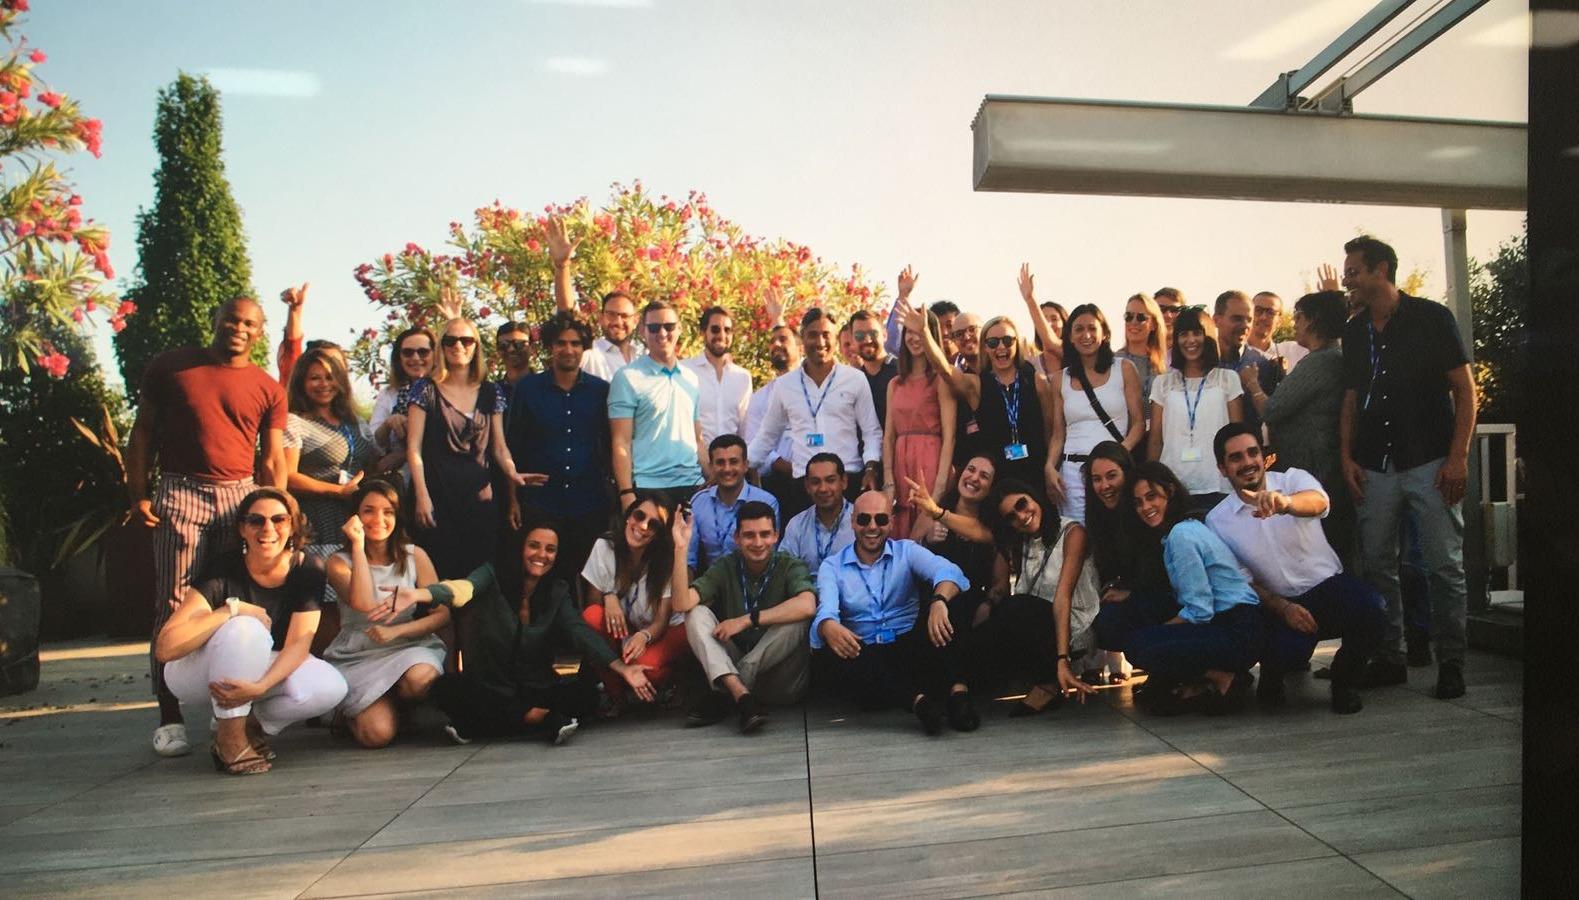 Luxottica Group - Métiers, recrutement, stages, offres d'emploi